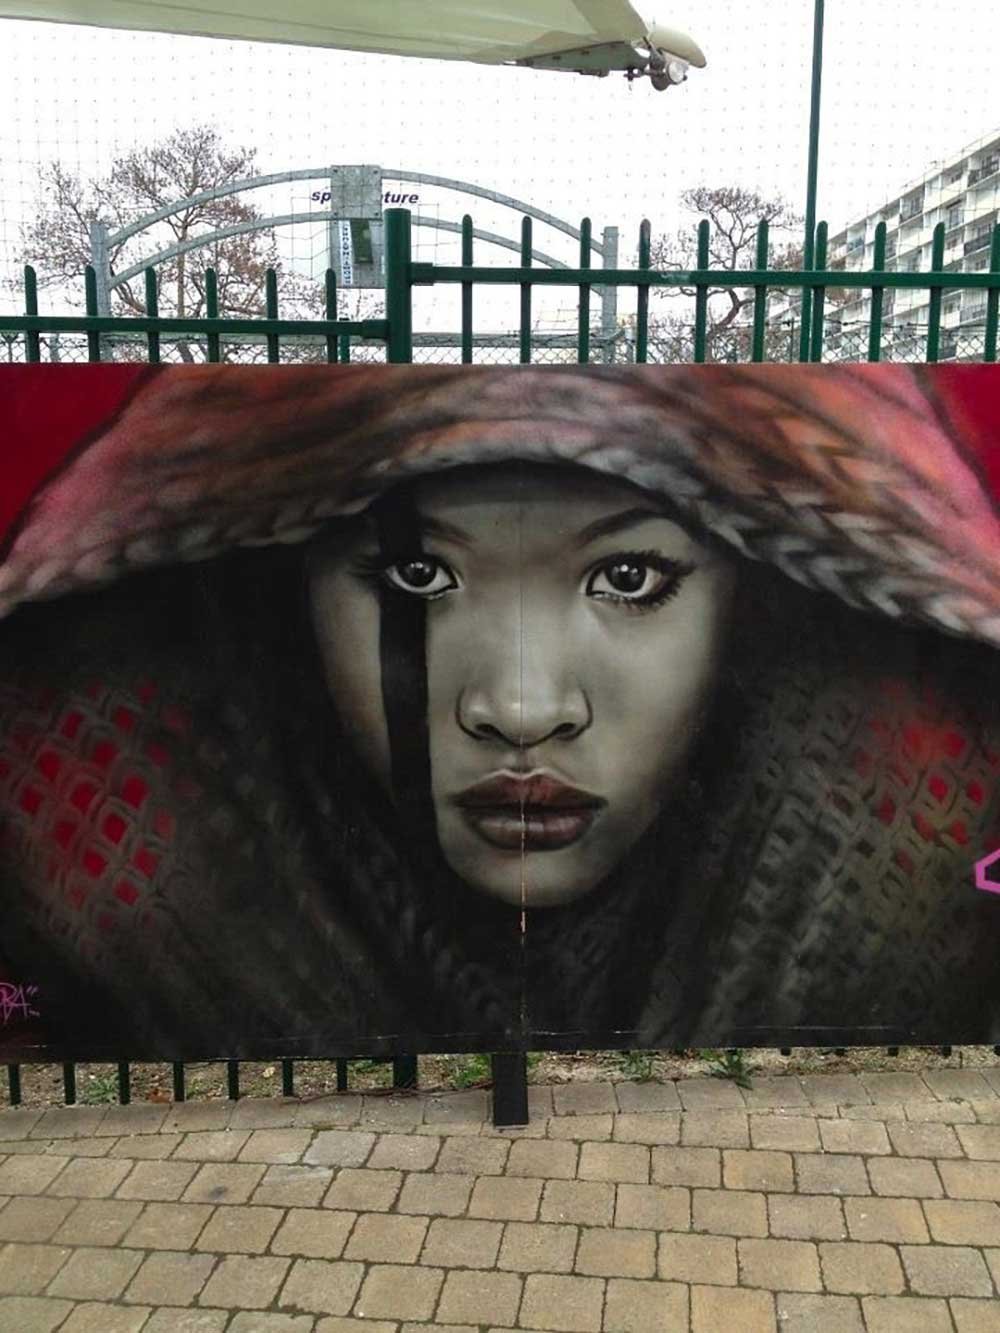 Street artist Alex Mac 3HC